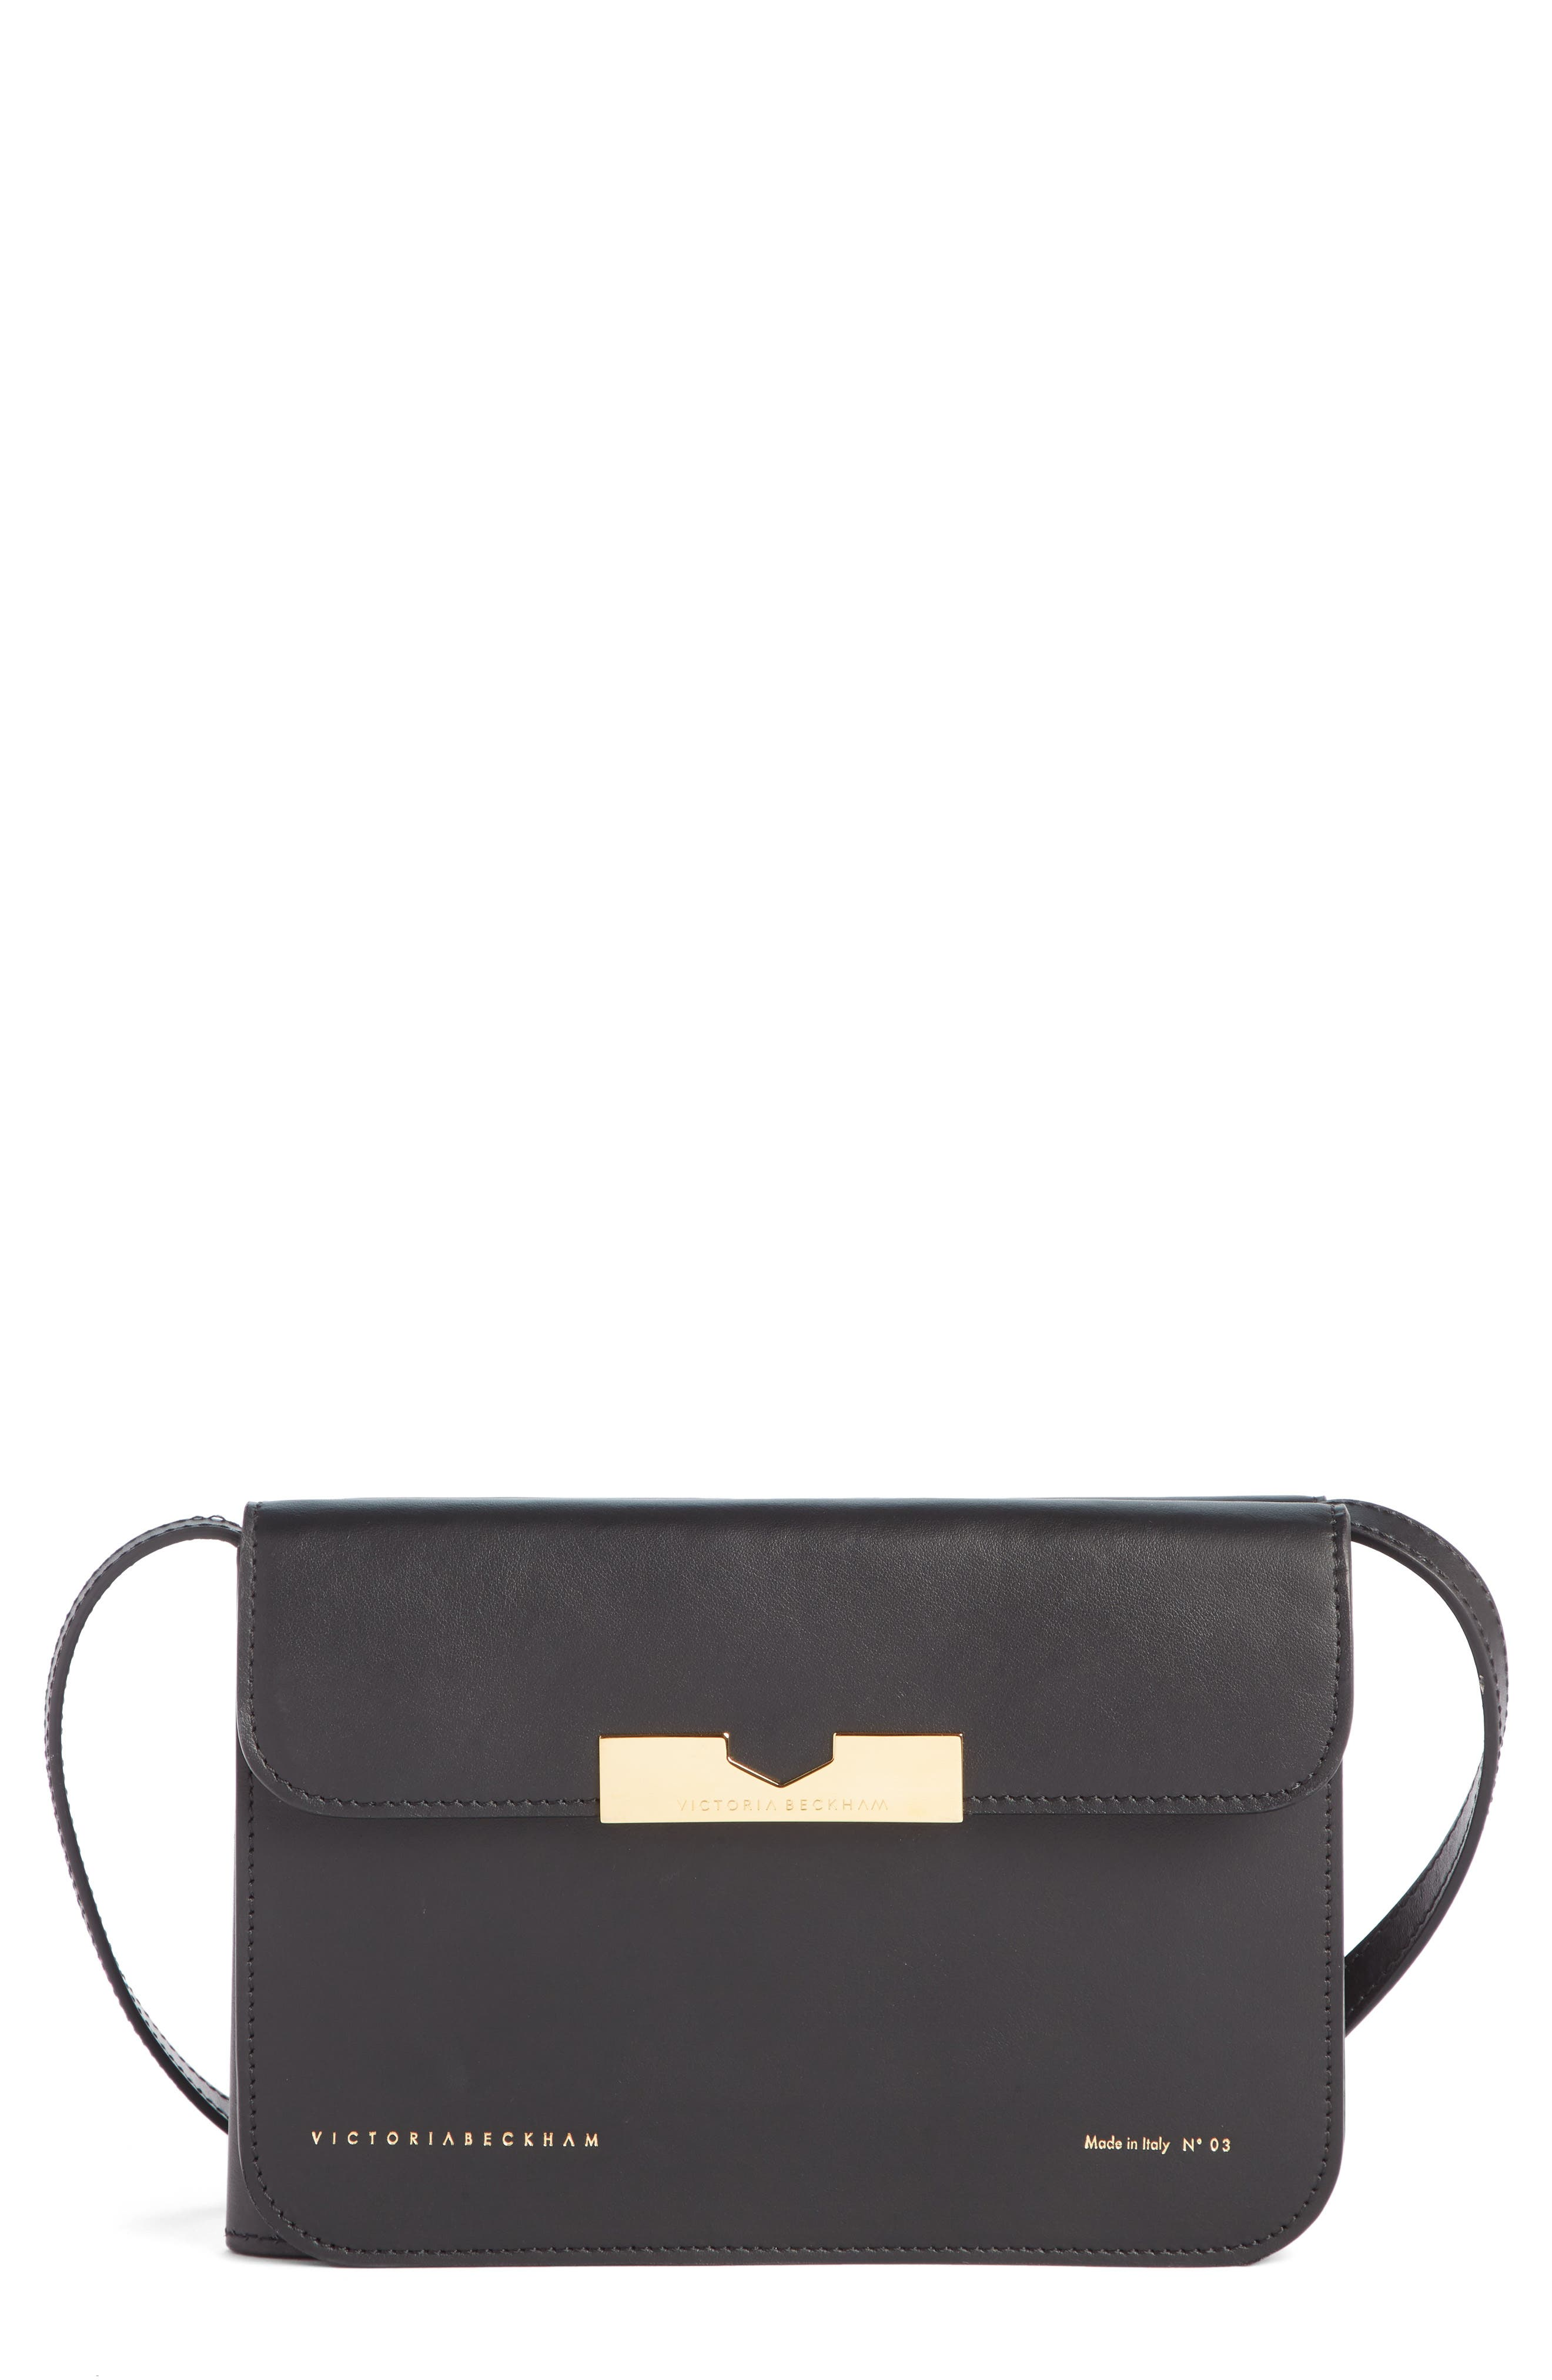 VICTORIA BECKHAM Twin Leather Crossbody Bag, Main, color, BLACK